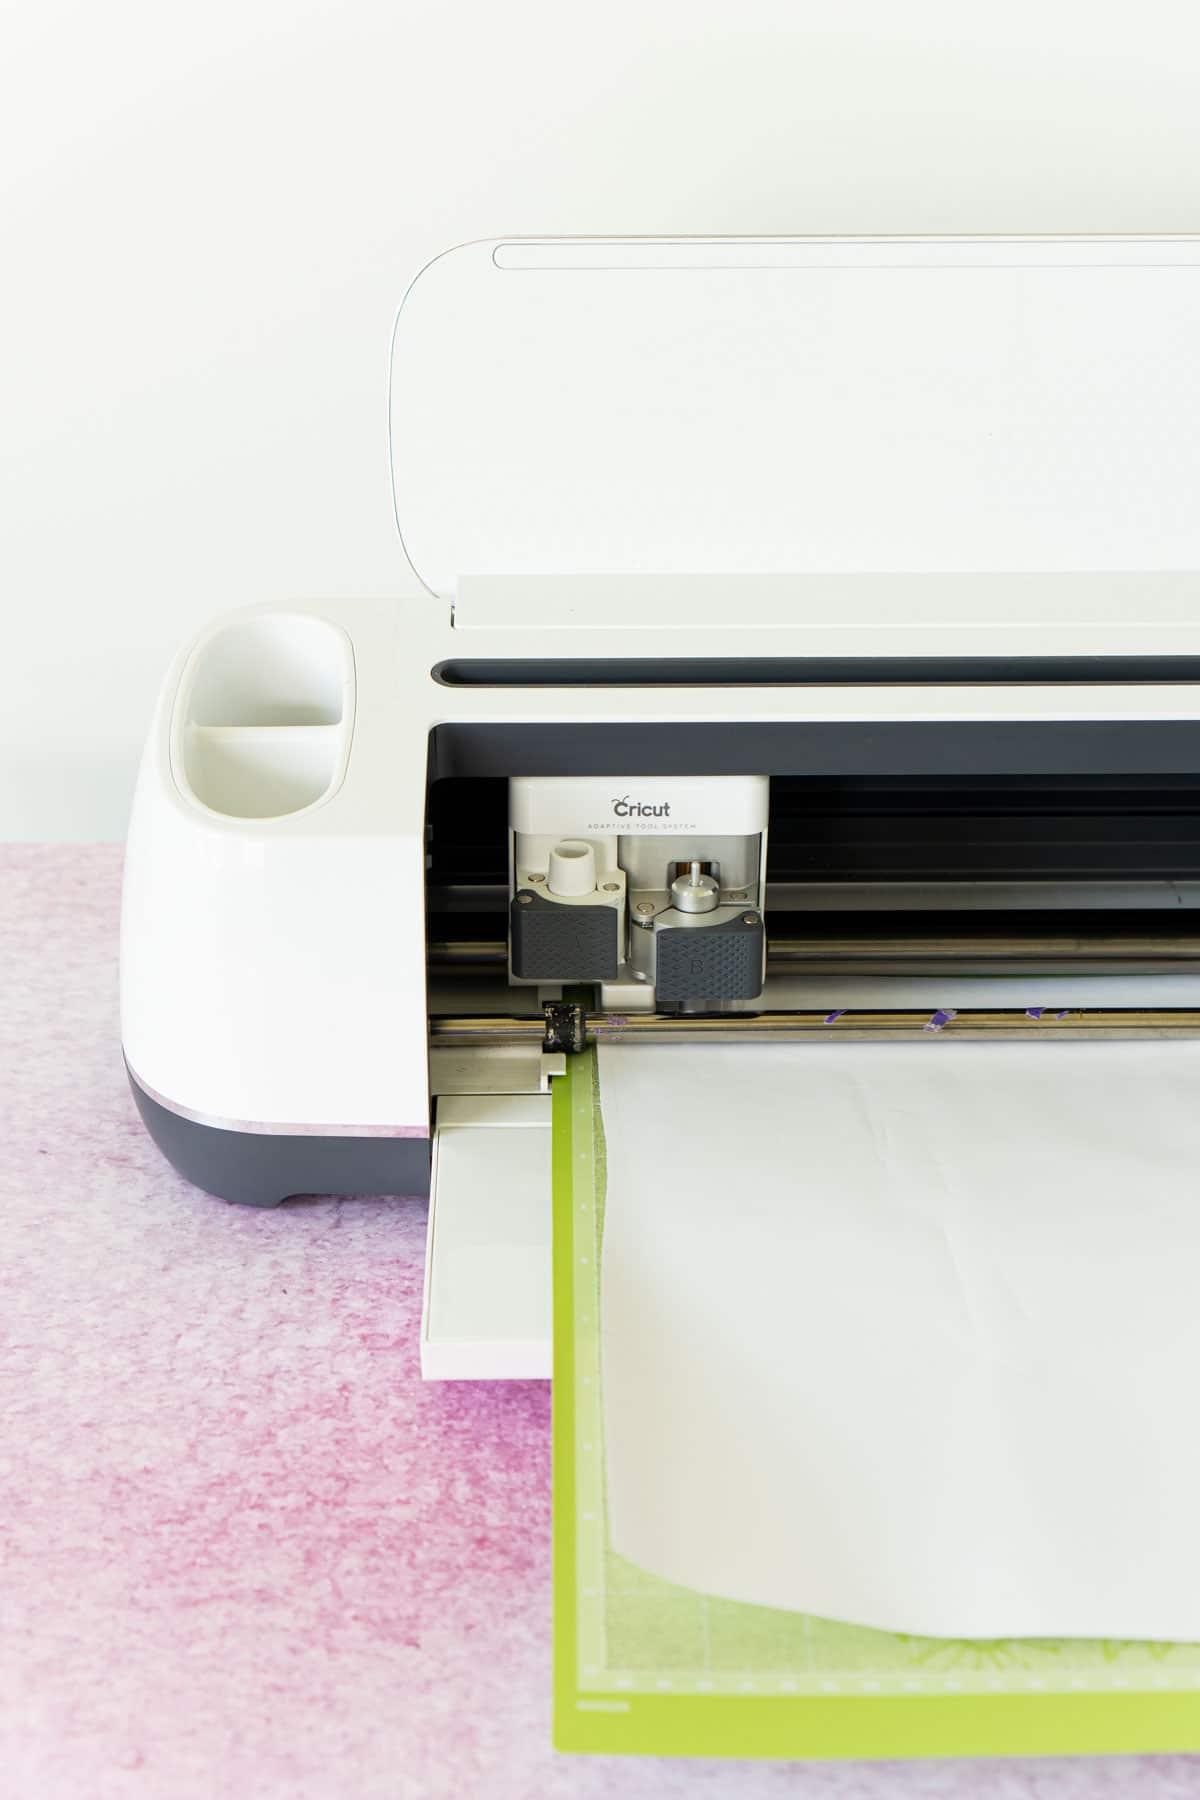 Cricut Maker with a piece of white vinyl on a green mat